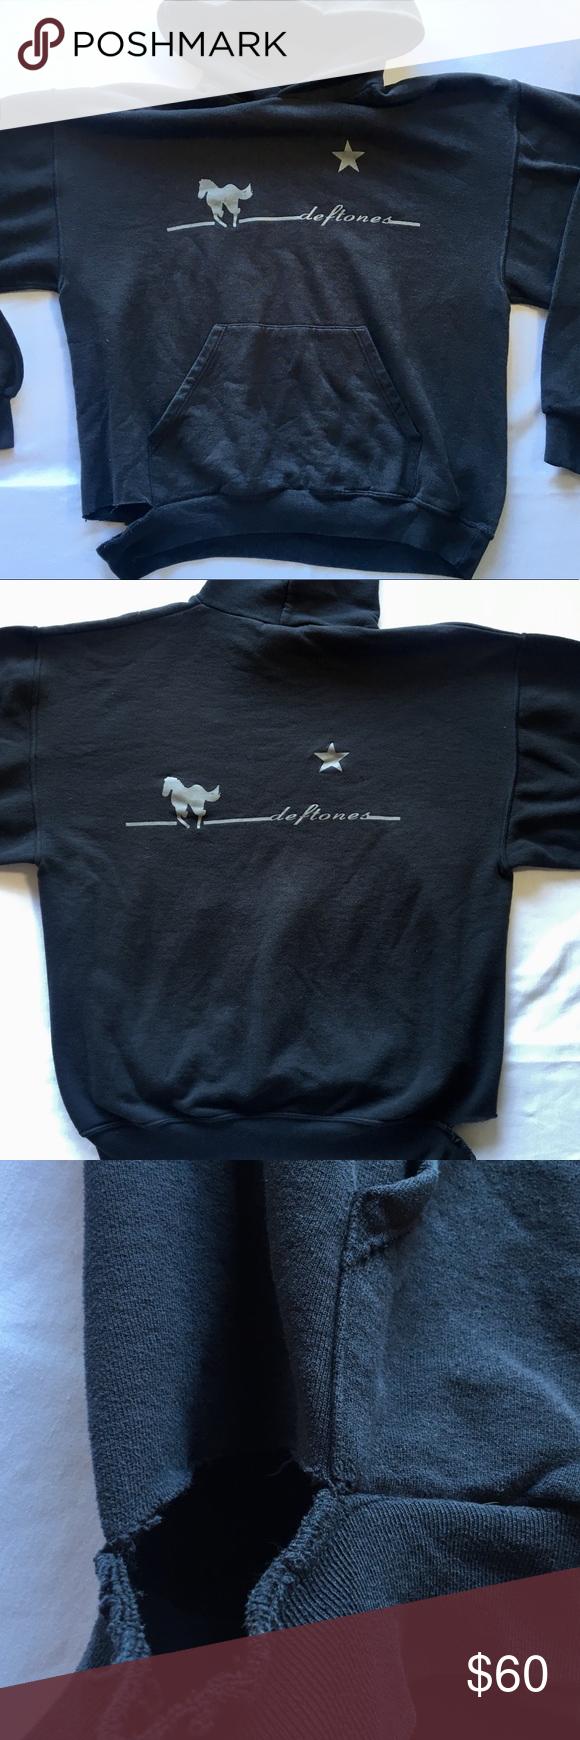 Deftones Hoodie Hoodies Tops Designs Women Shopping [ 1740 x 580 Pixel ]